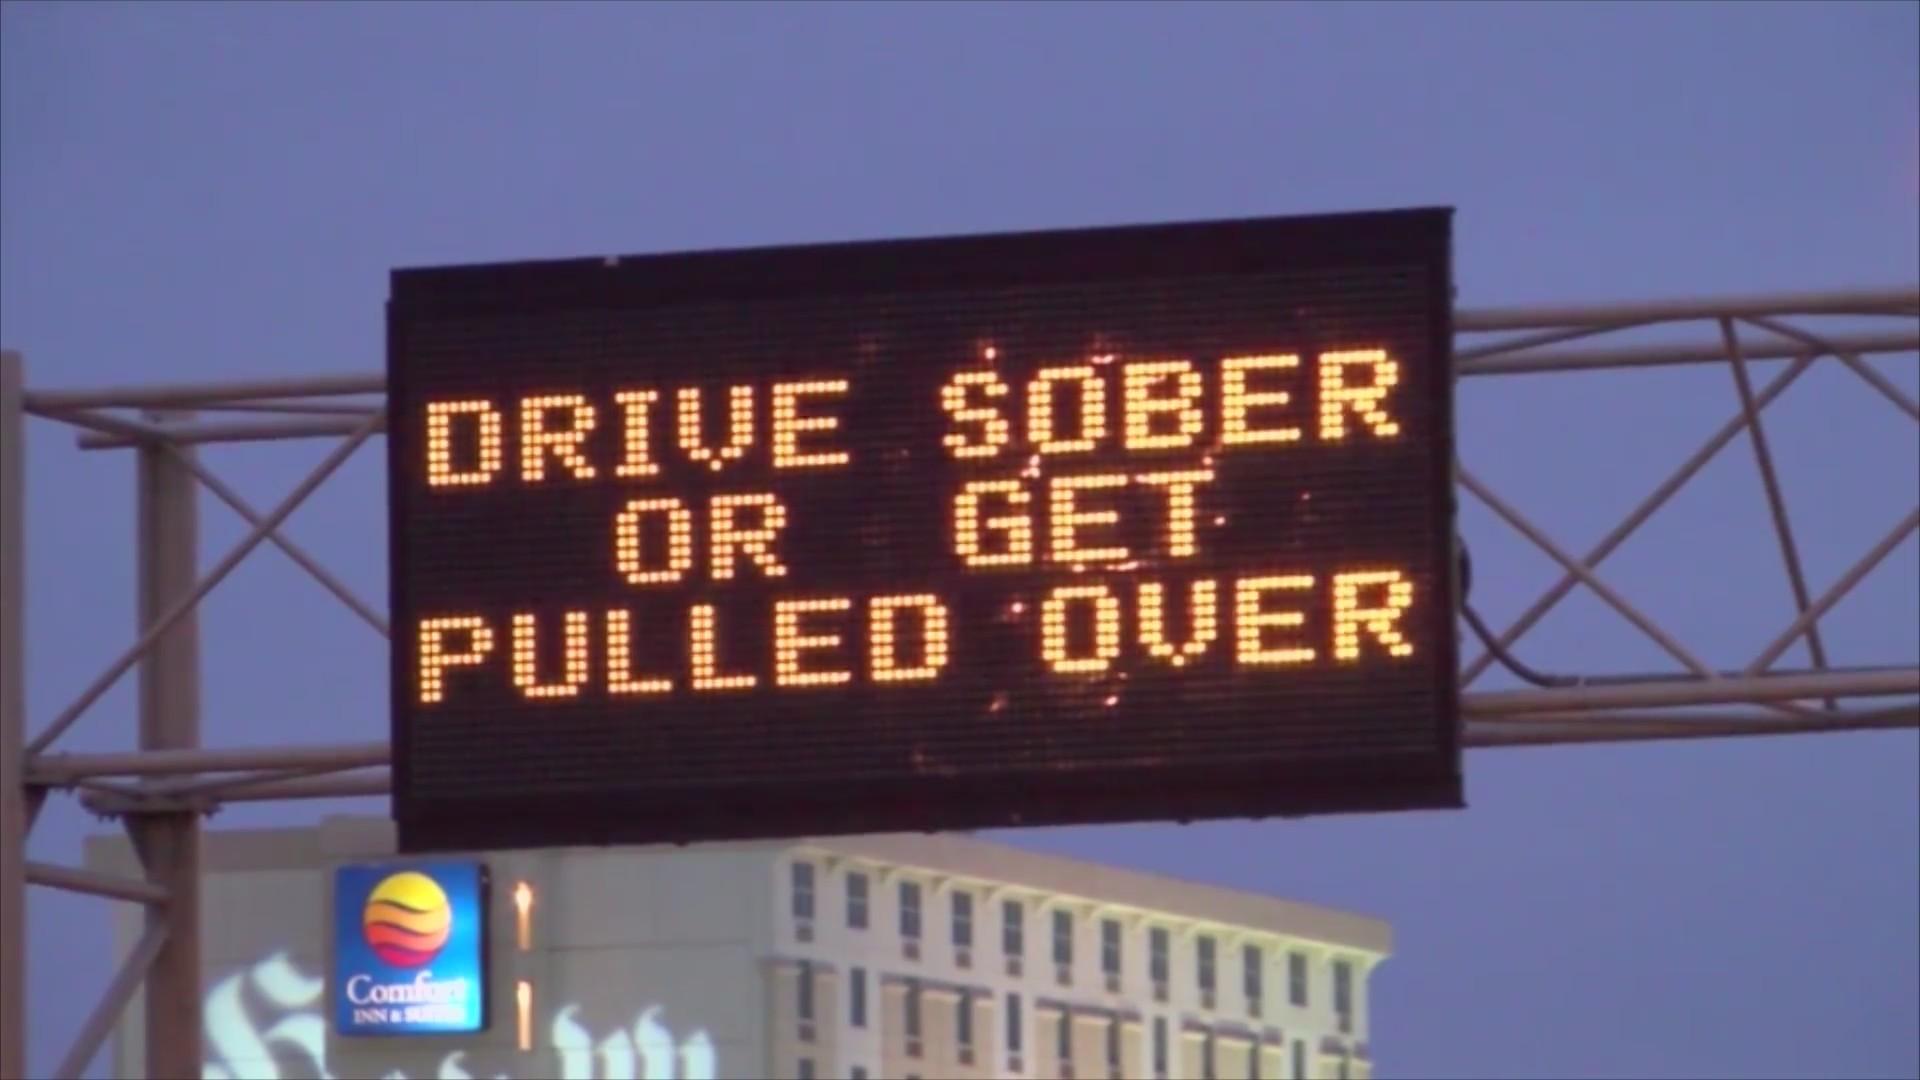 DEADLIEST WEEK FOR DRIVERS